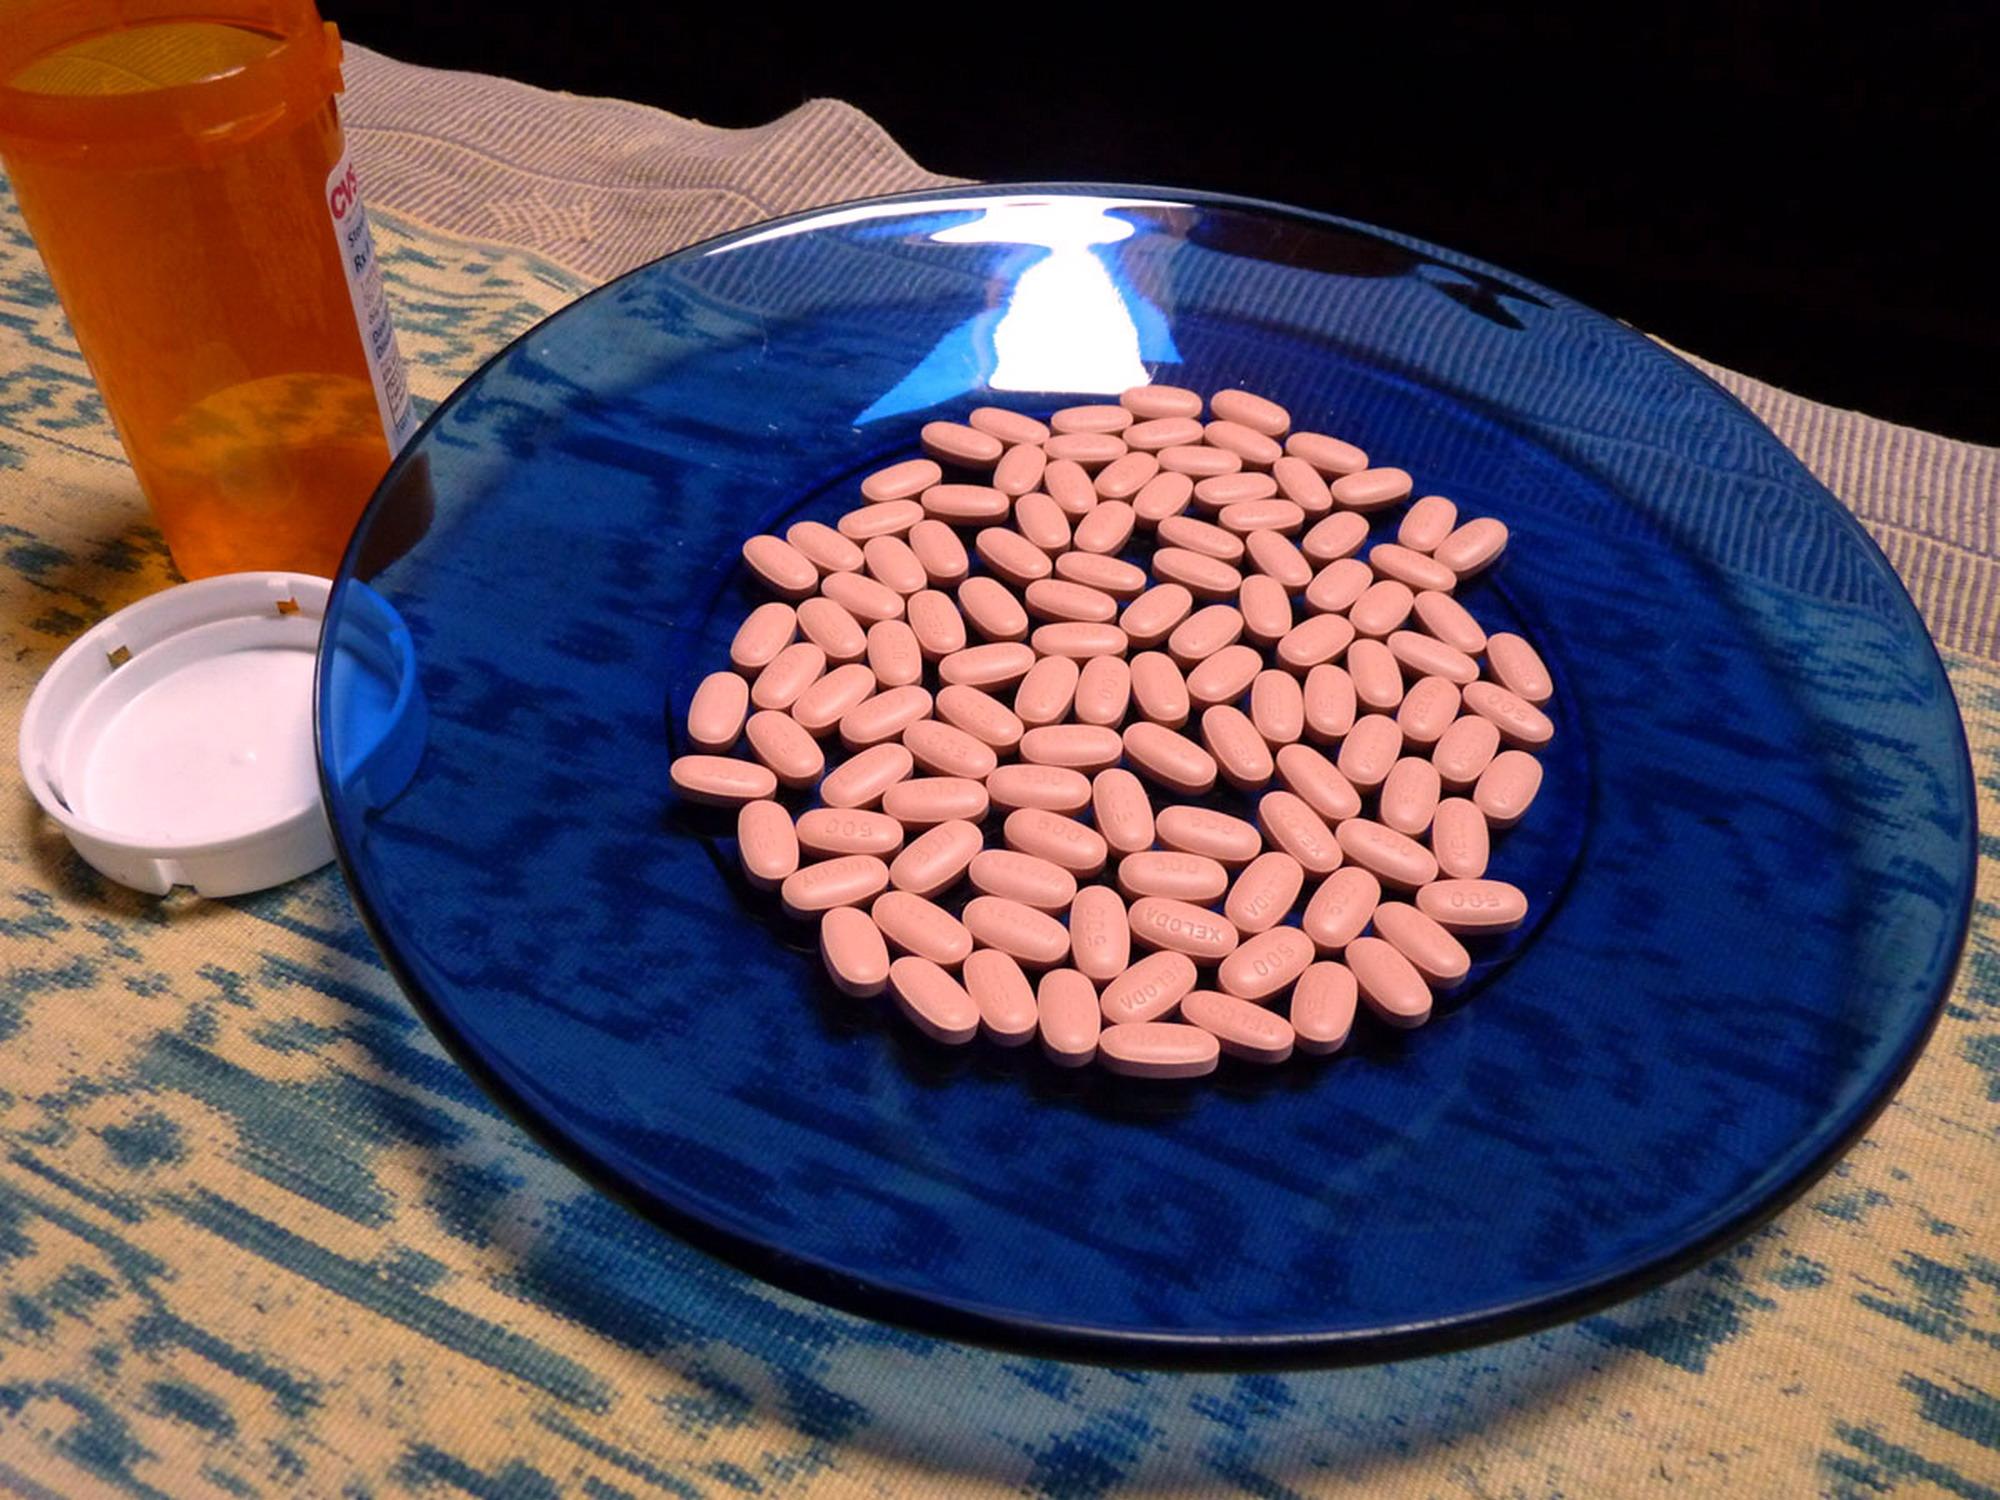 Farmaco da banco viagra